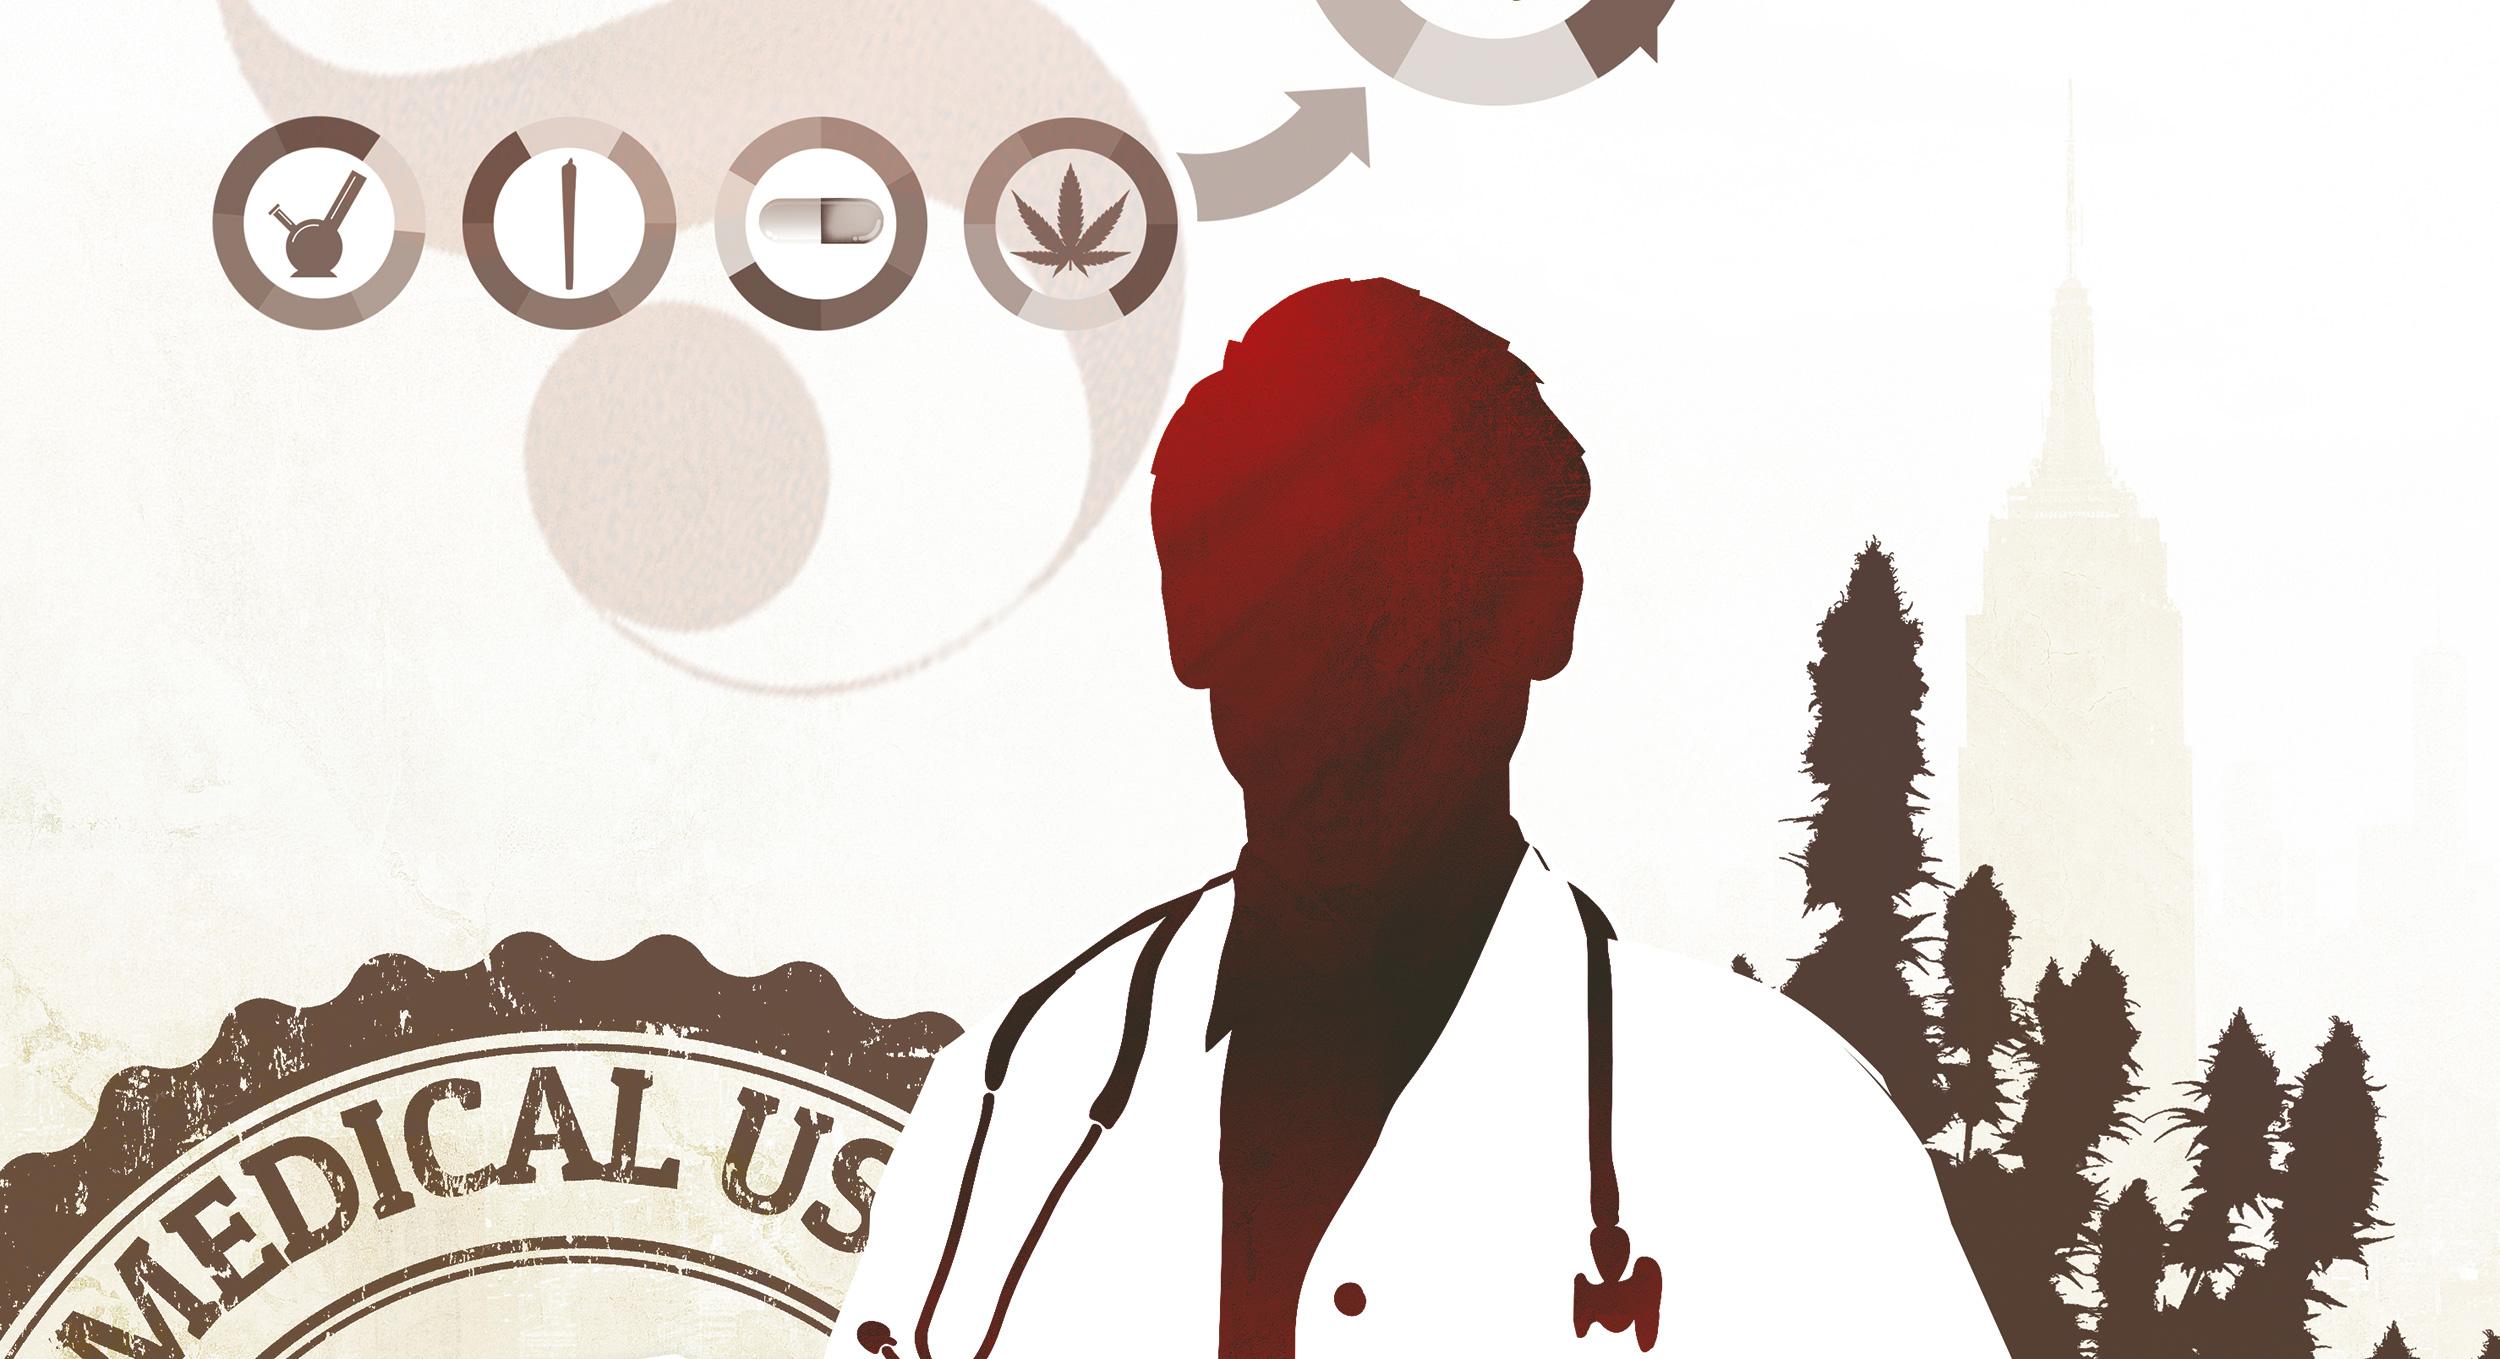 Cannabisgesetz-(01)